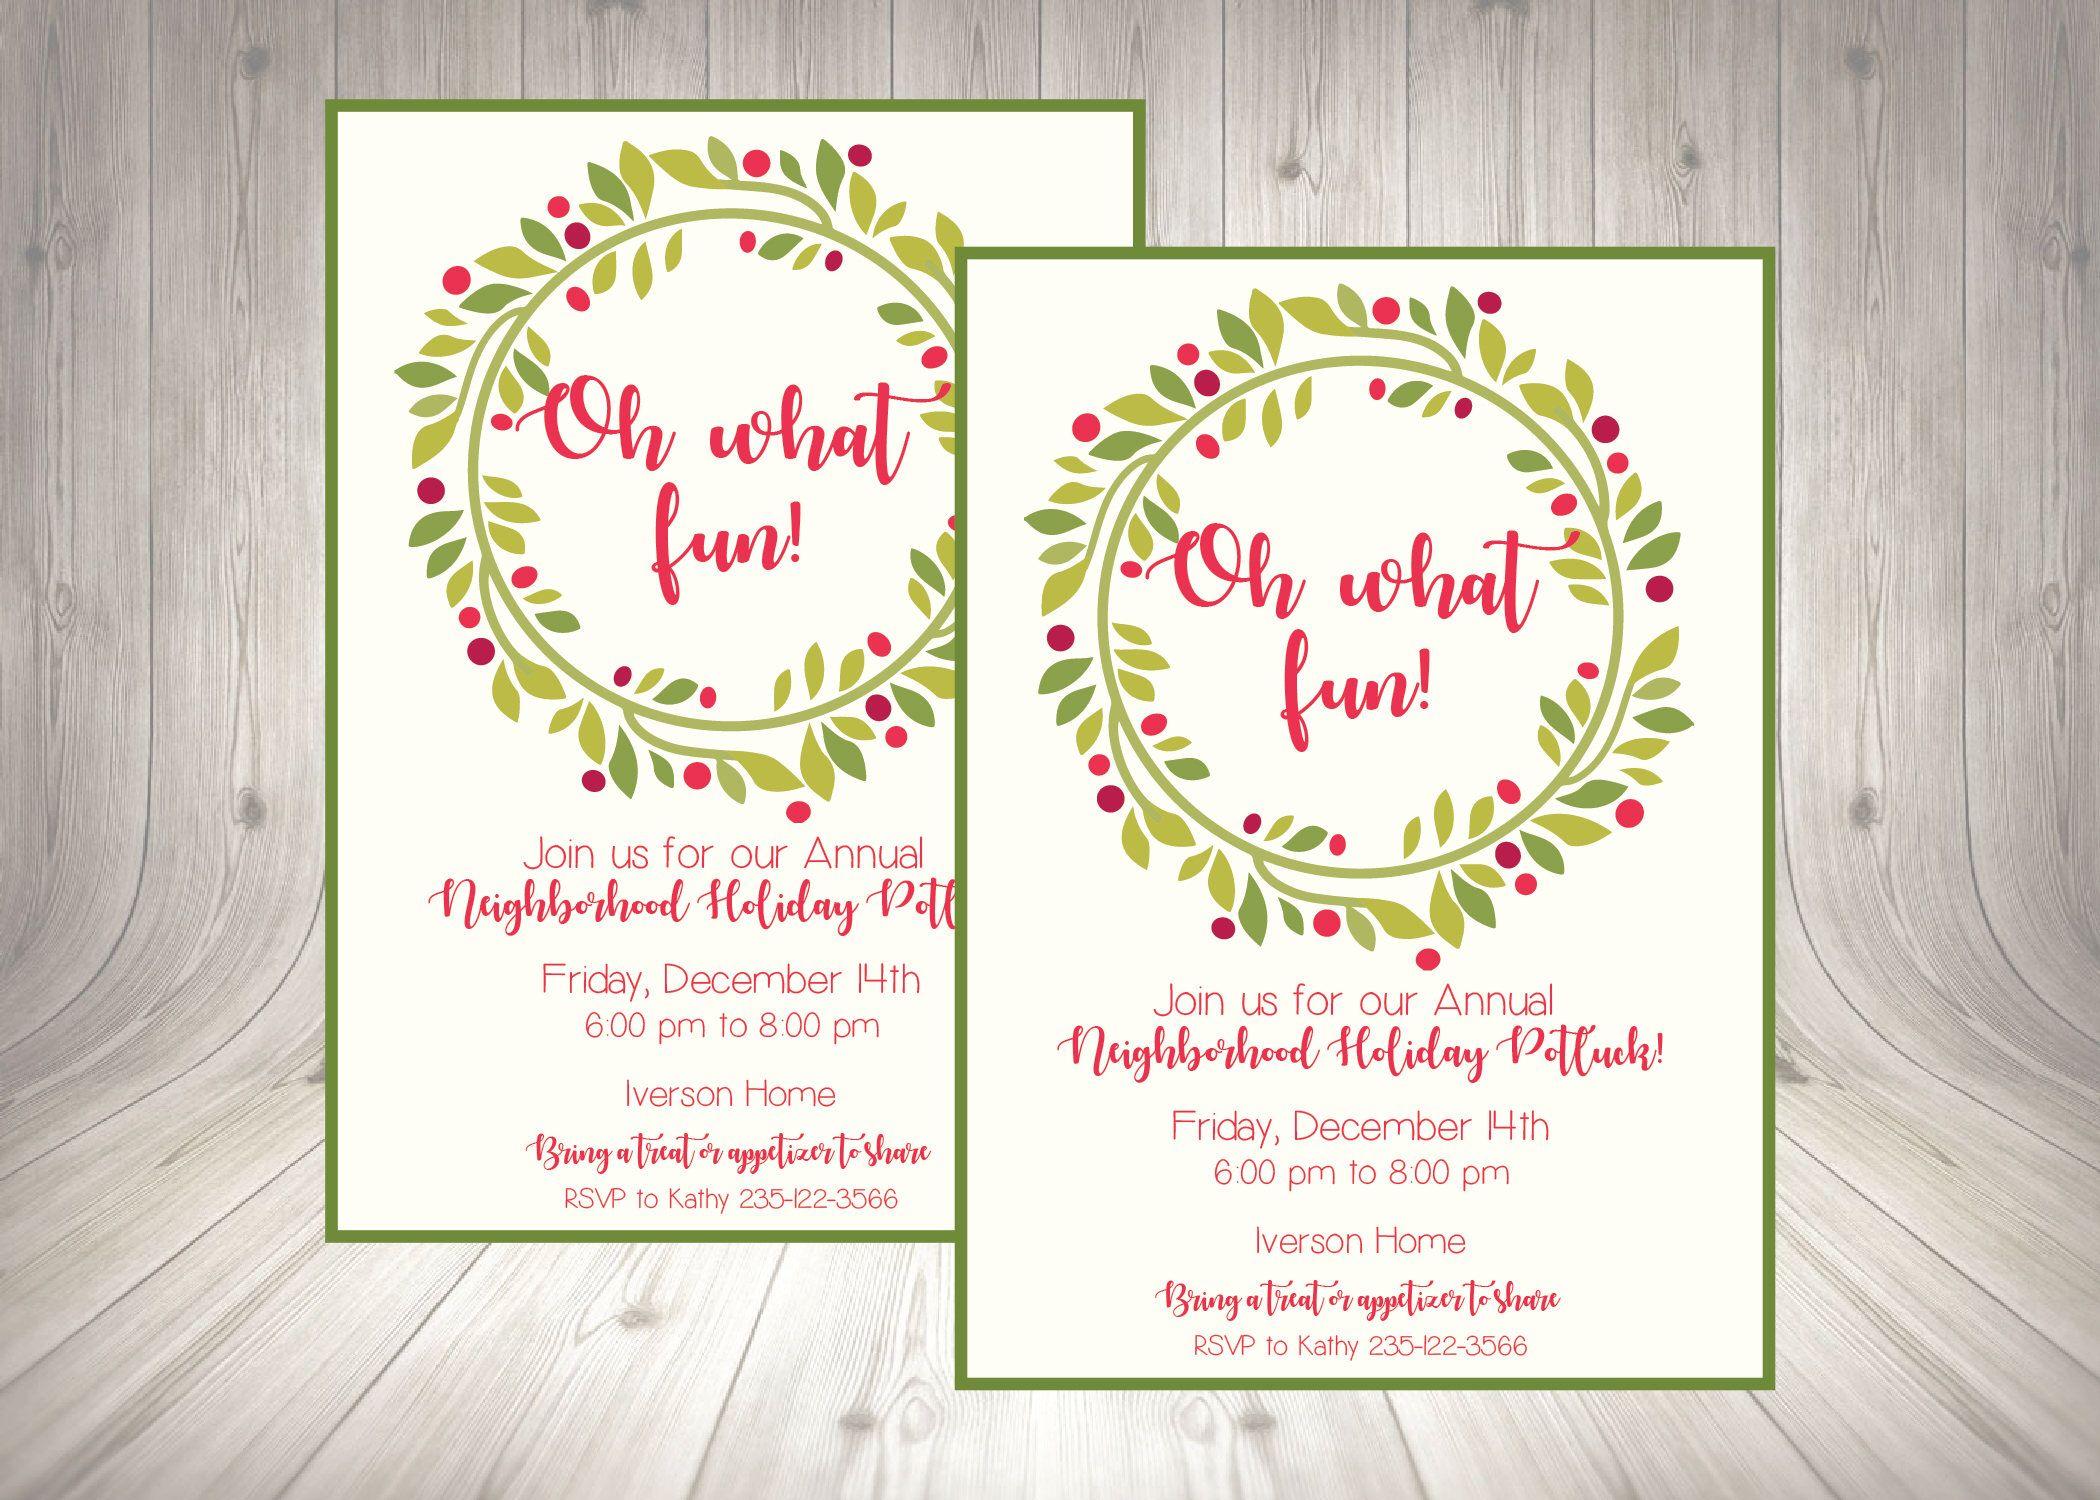 Good Neighborhood Christmas Party Ideas Part - 12: Neighborhood Christmas Holiday Party Invitation / Work Holiday Party Invite  /Church Christmas Party Flyer /